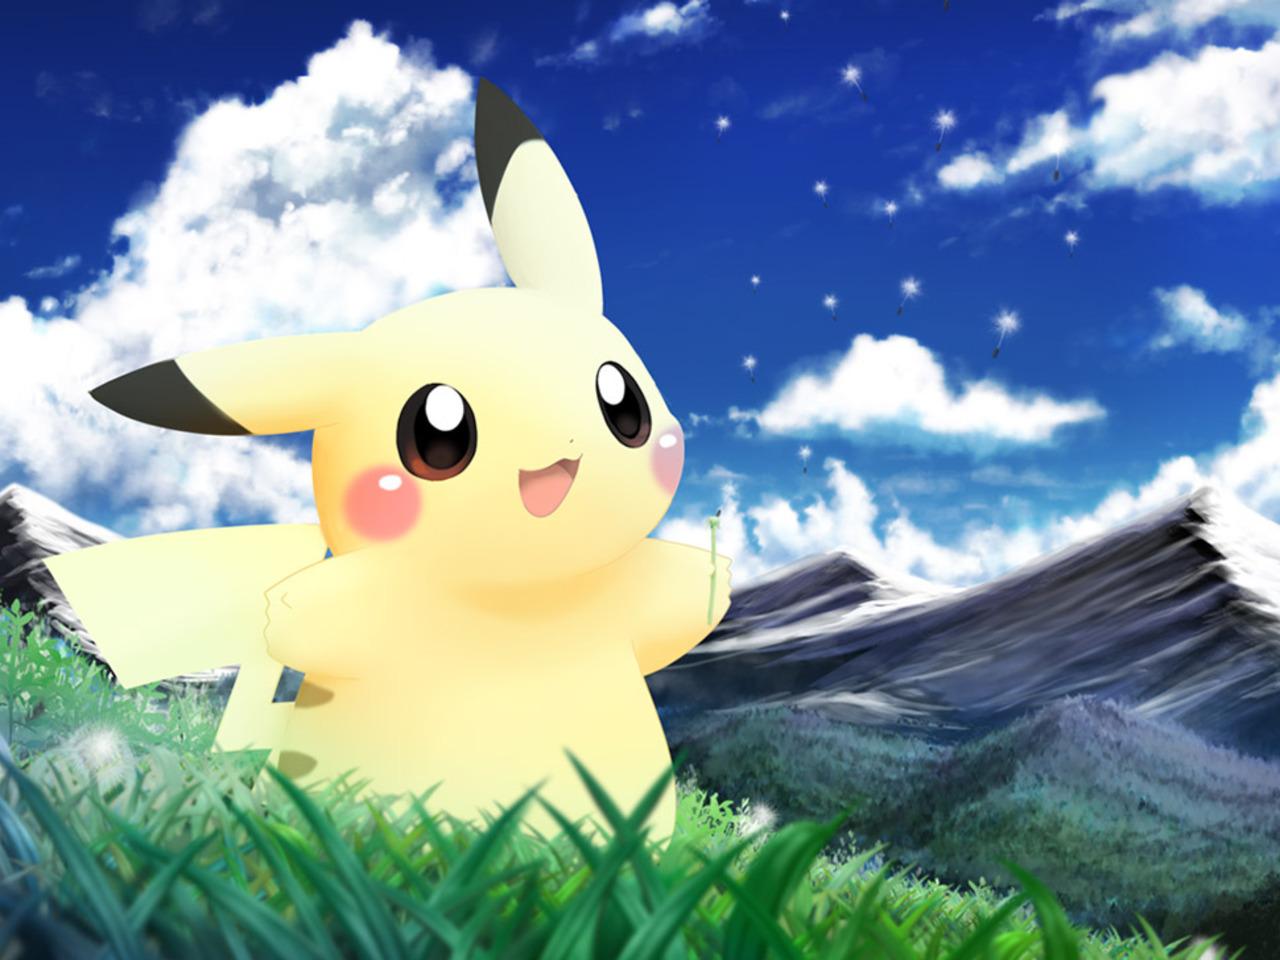 Pikachu Wallpaper   Pikachu Wallpaper 24422945 1280x960